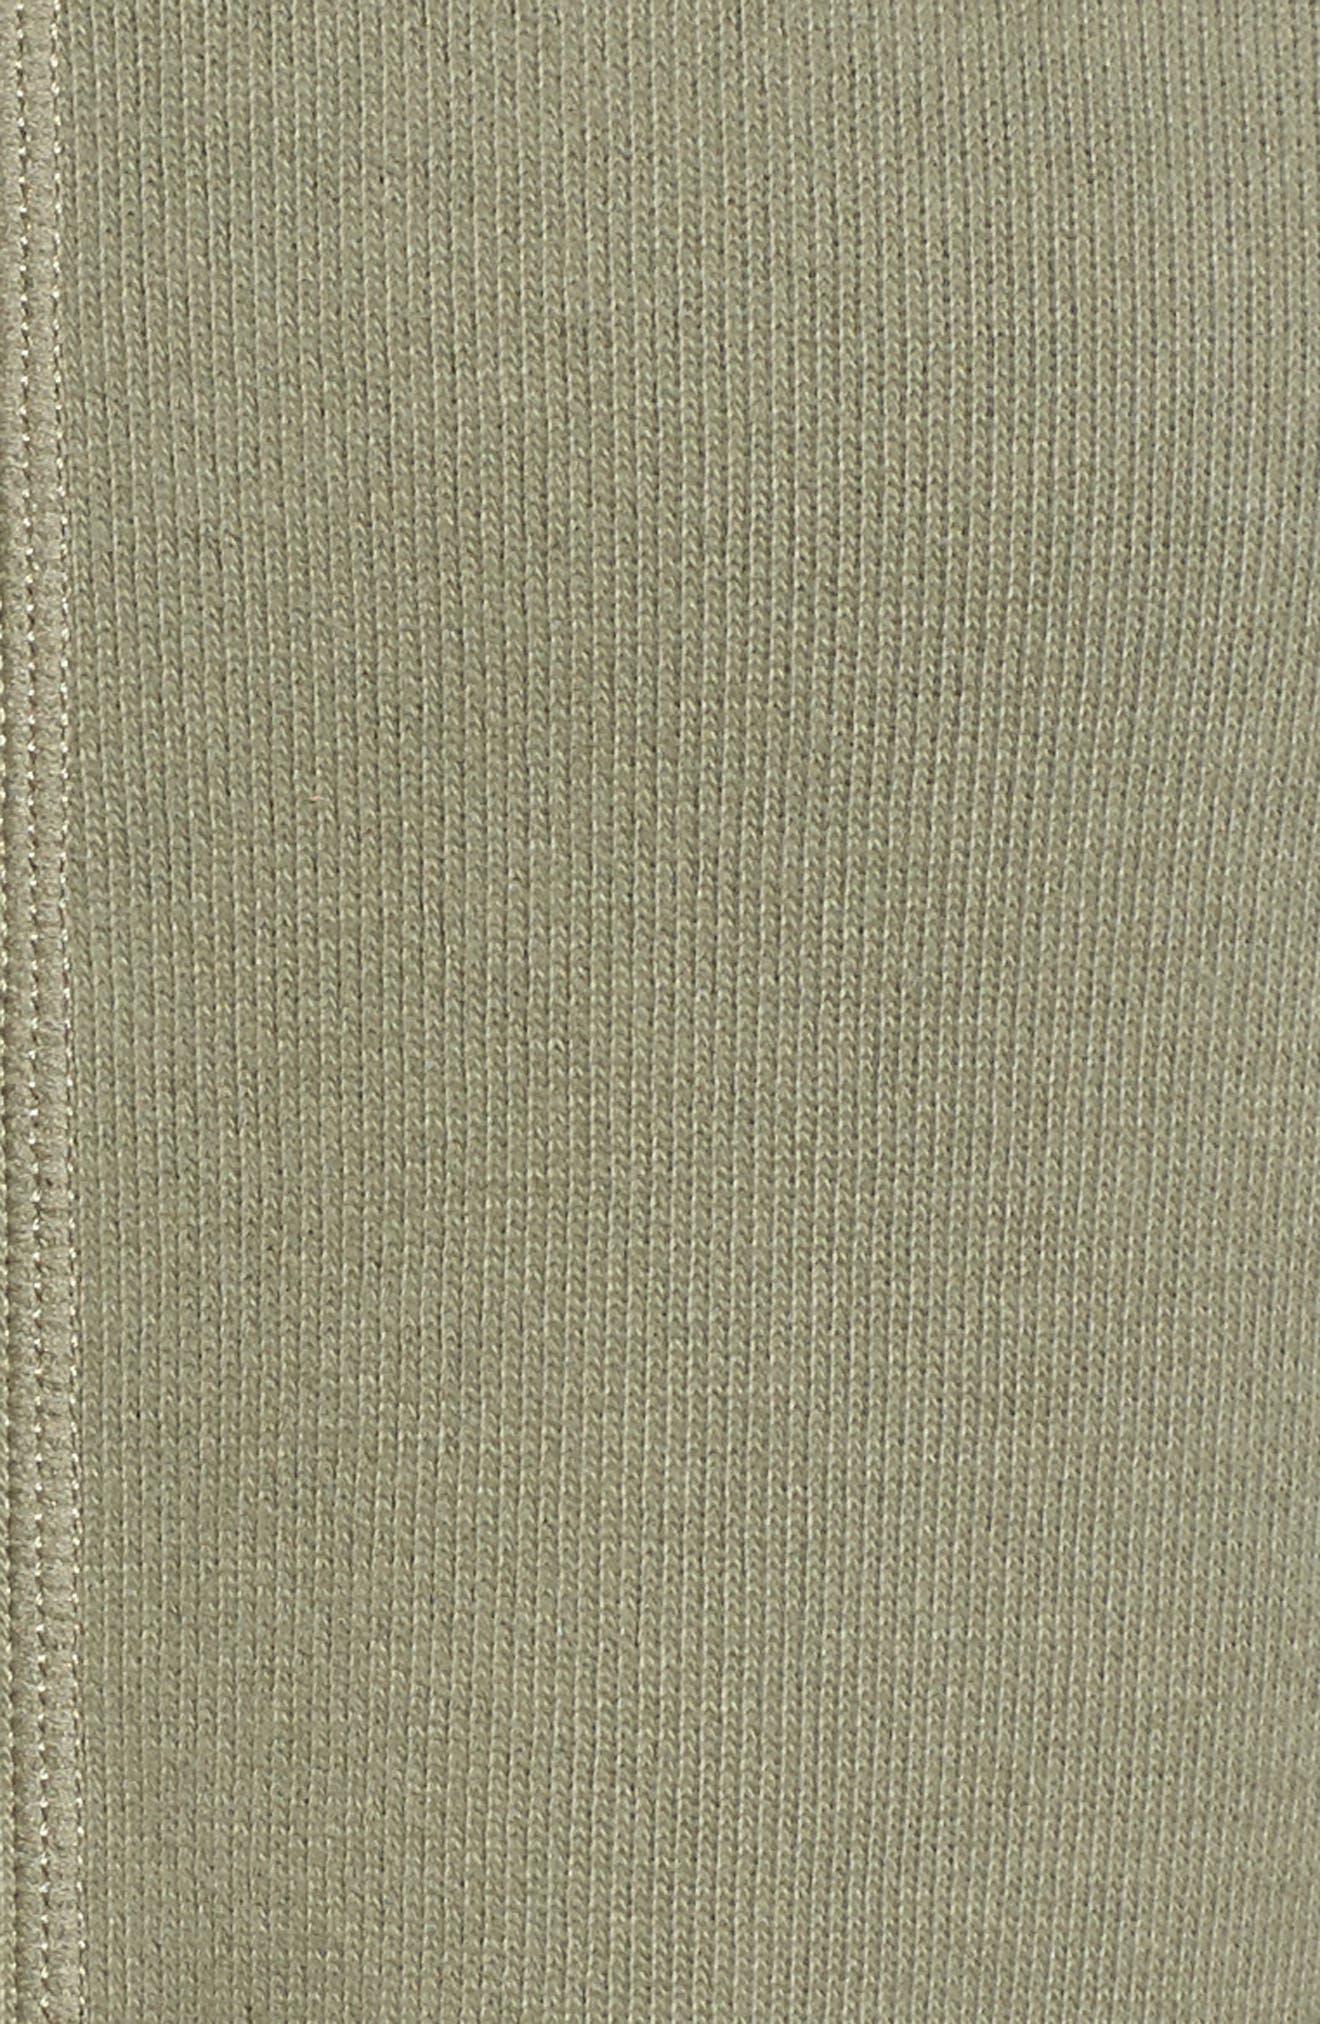 'Aruba' Full Zip Sweatshirt,                             Alternate thumbnail 35, color,